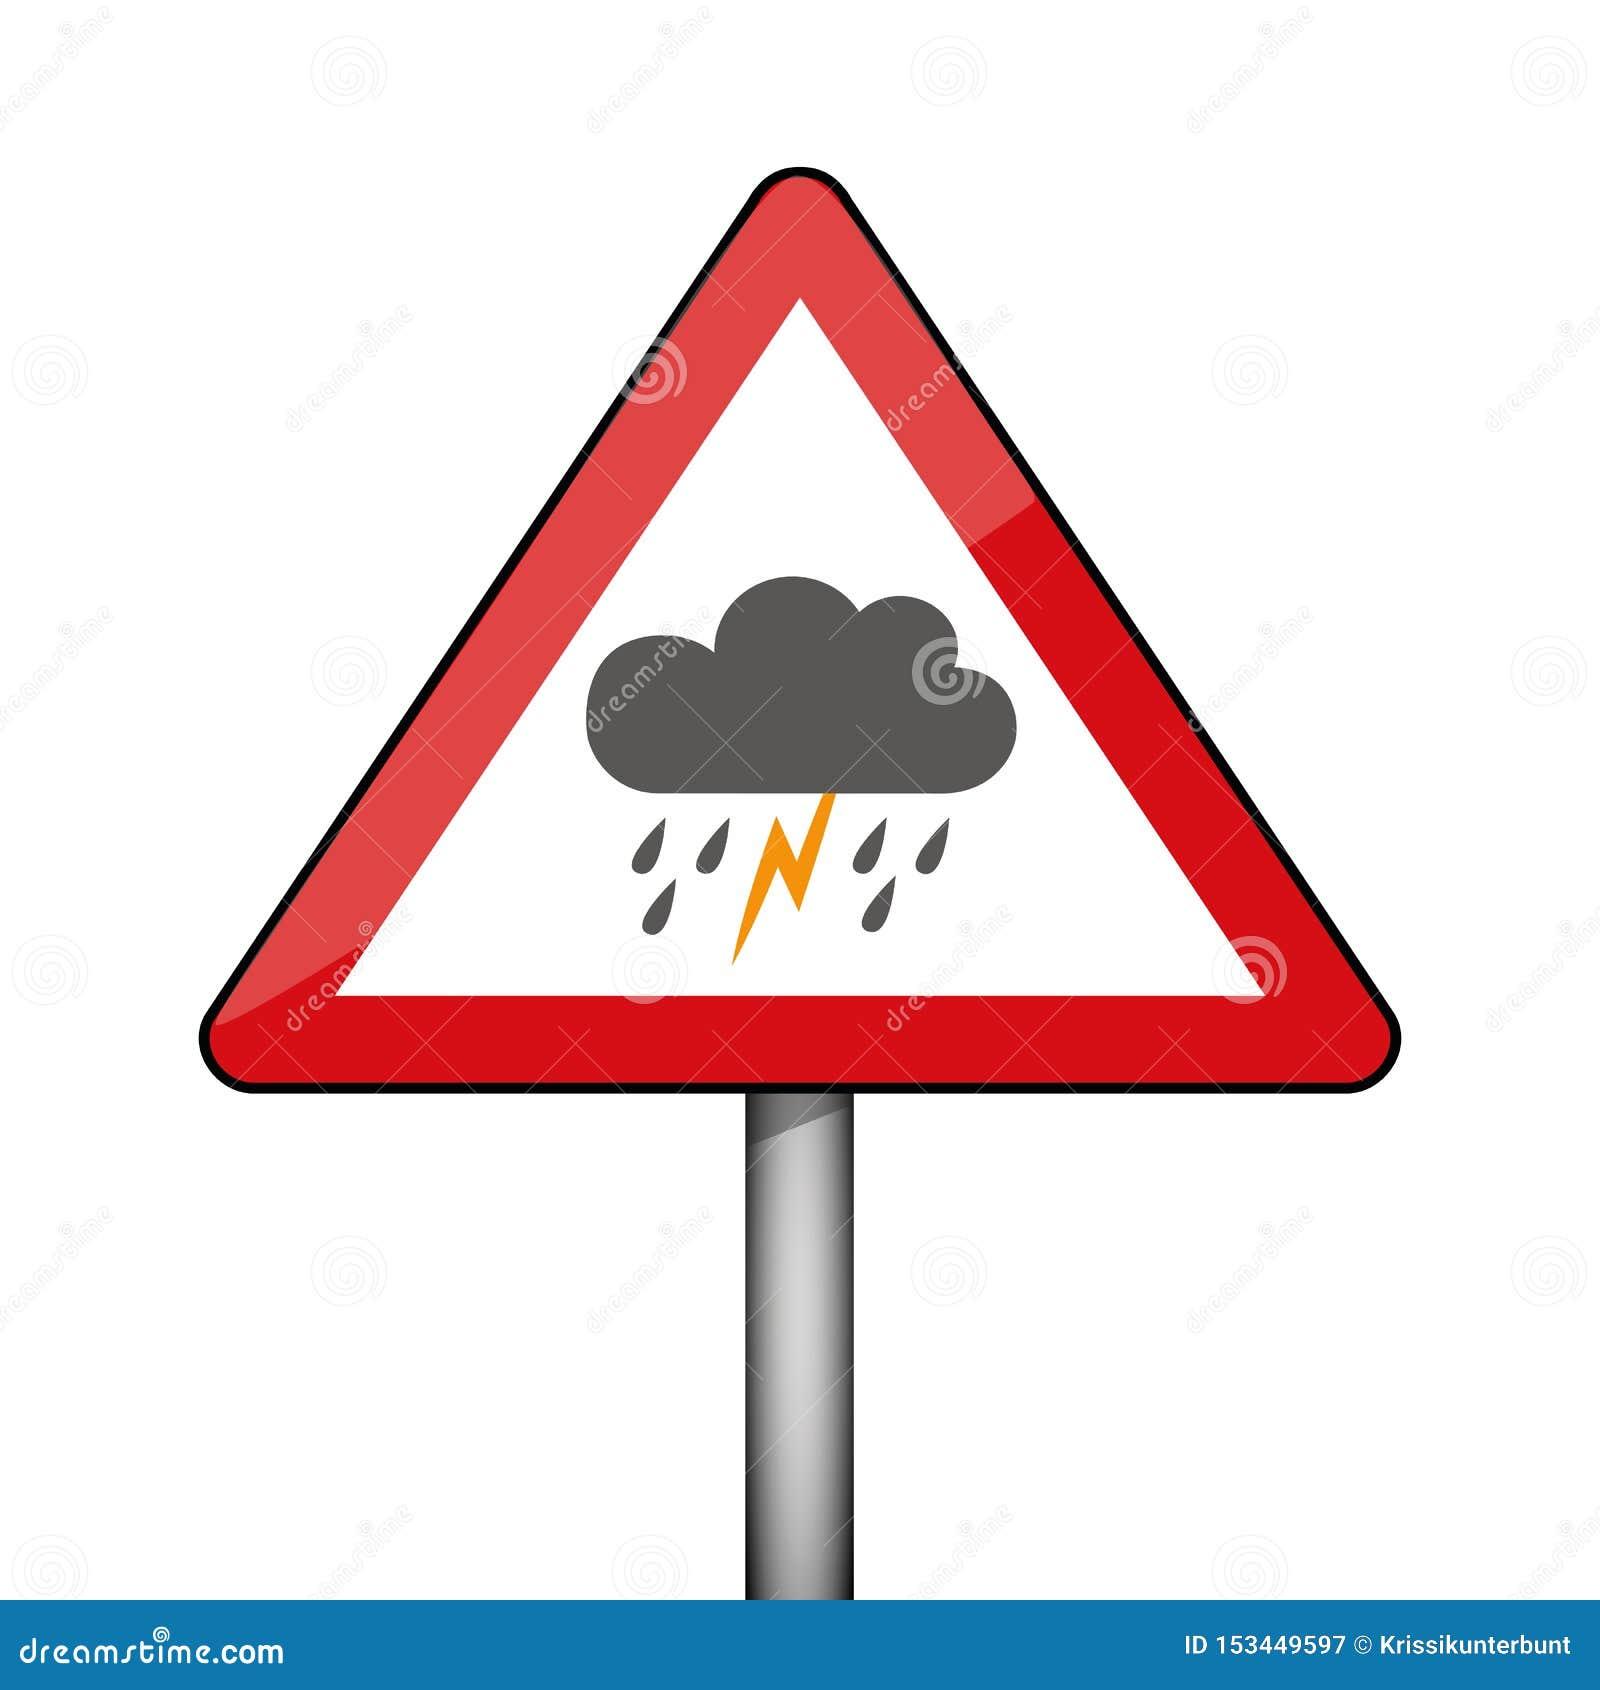 triangular warning sign thunderstorm weather stock vector